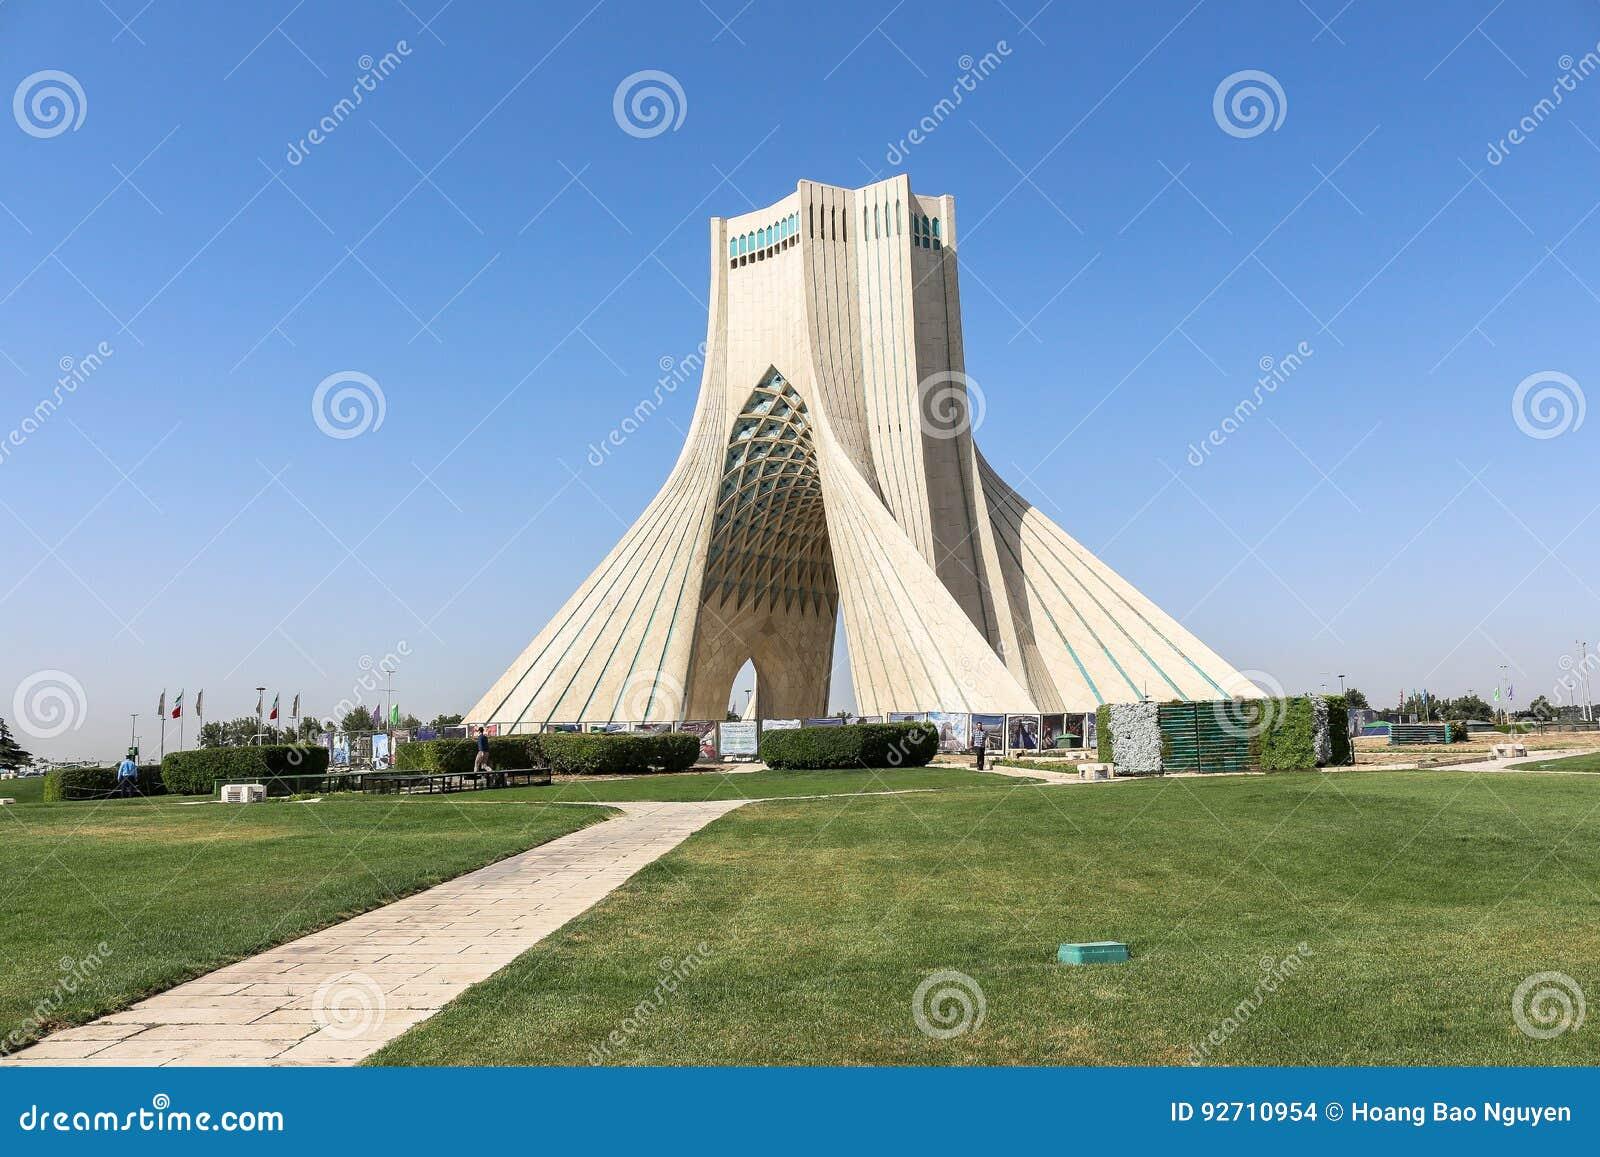 Azadi Tower in Tehran, Iran